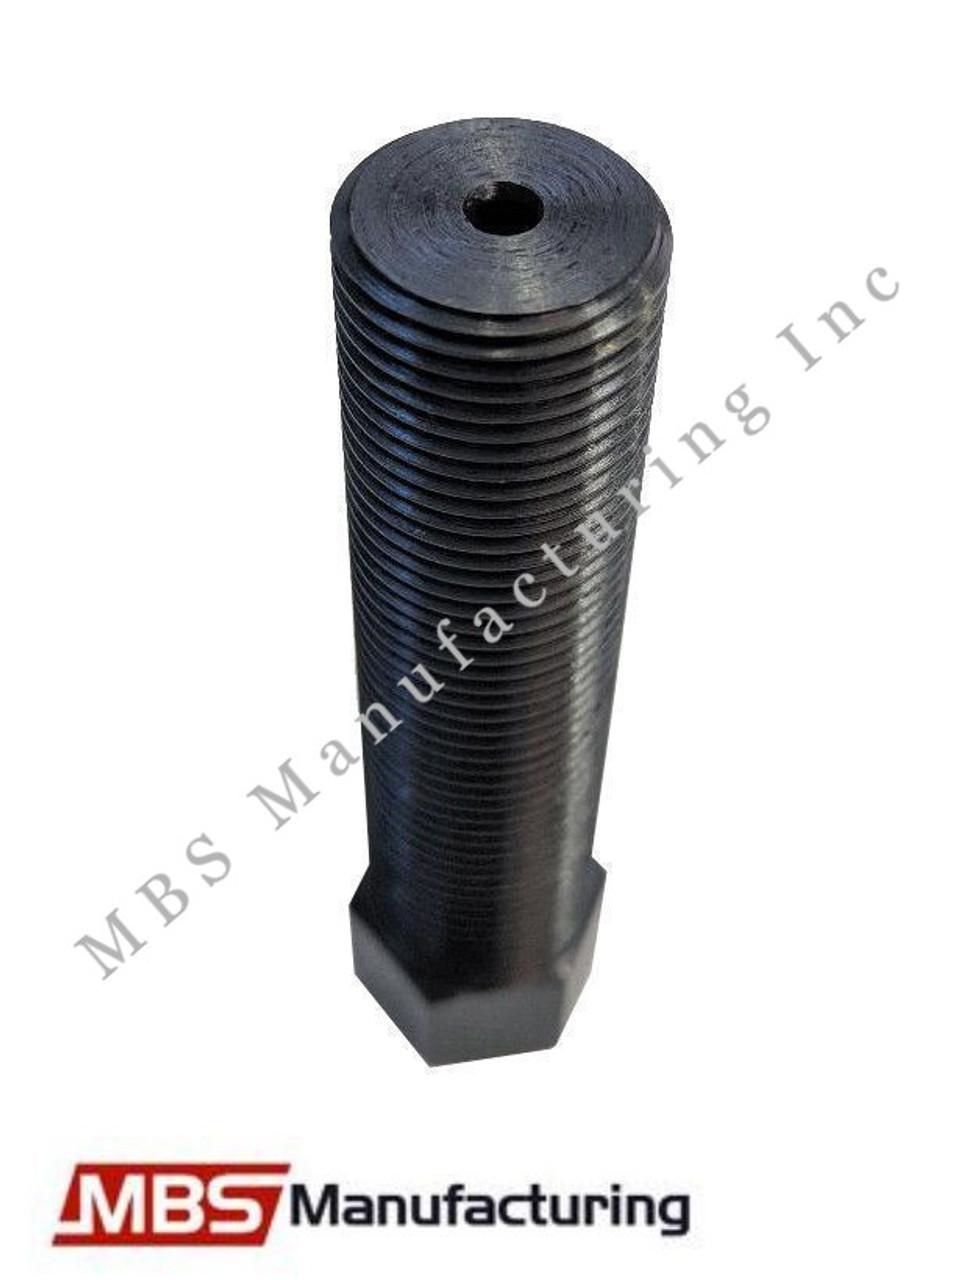 Compatible for Kawasaki Jet Ski SXR800 Flywheel Puller [18mm x 1.5mm]